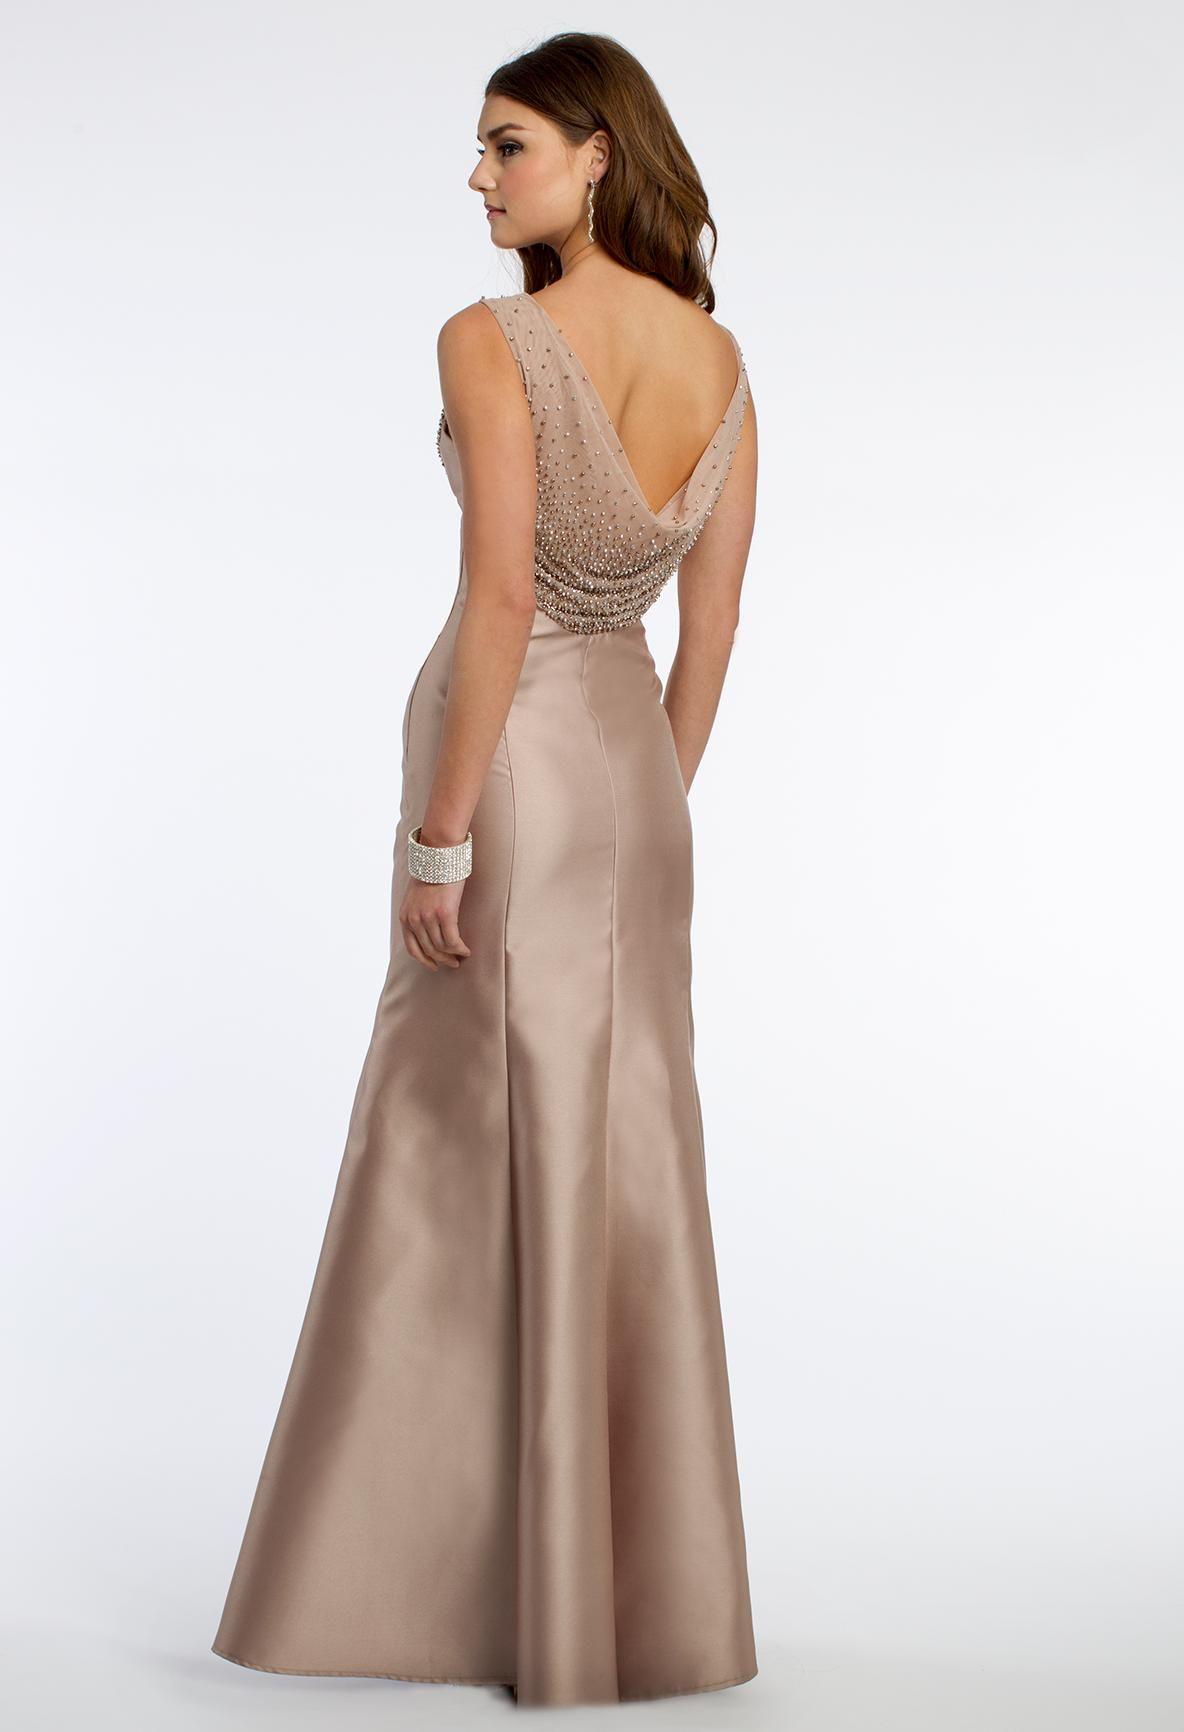 fe81baf3c6 Cowl Neck Prom Dress  camillelavie  CLVprom